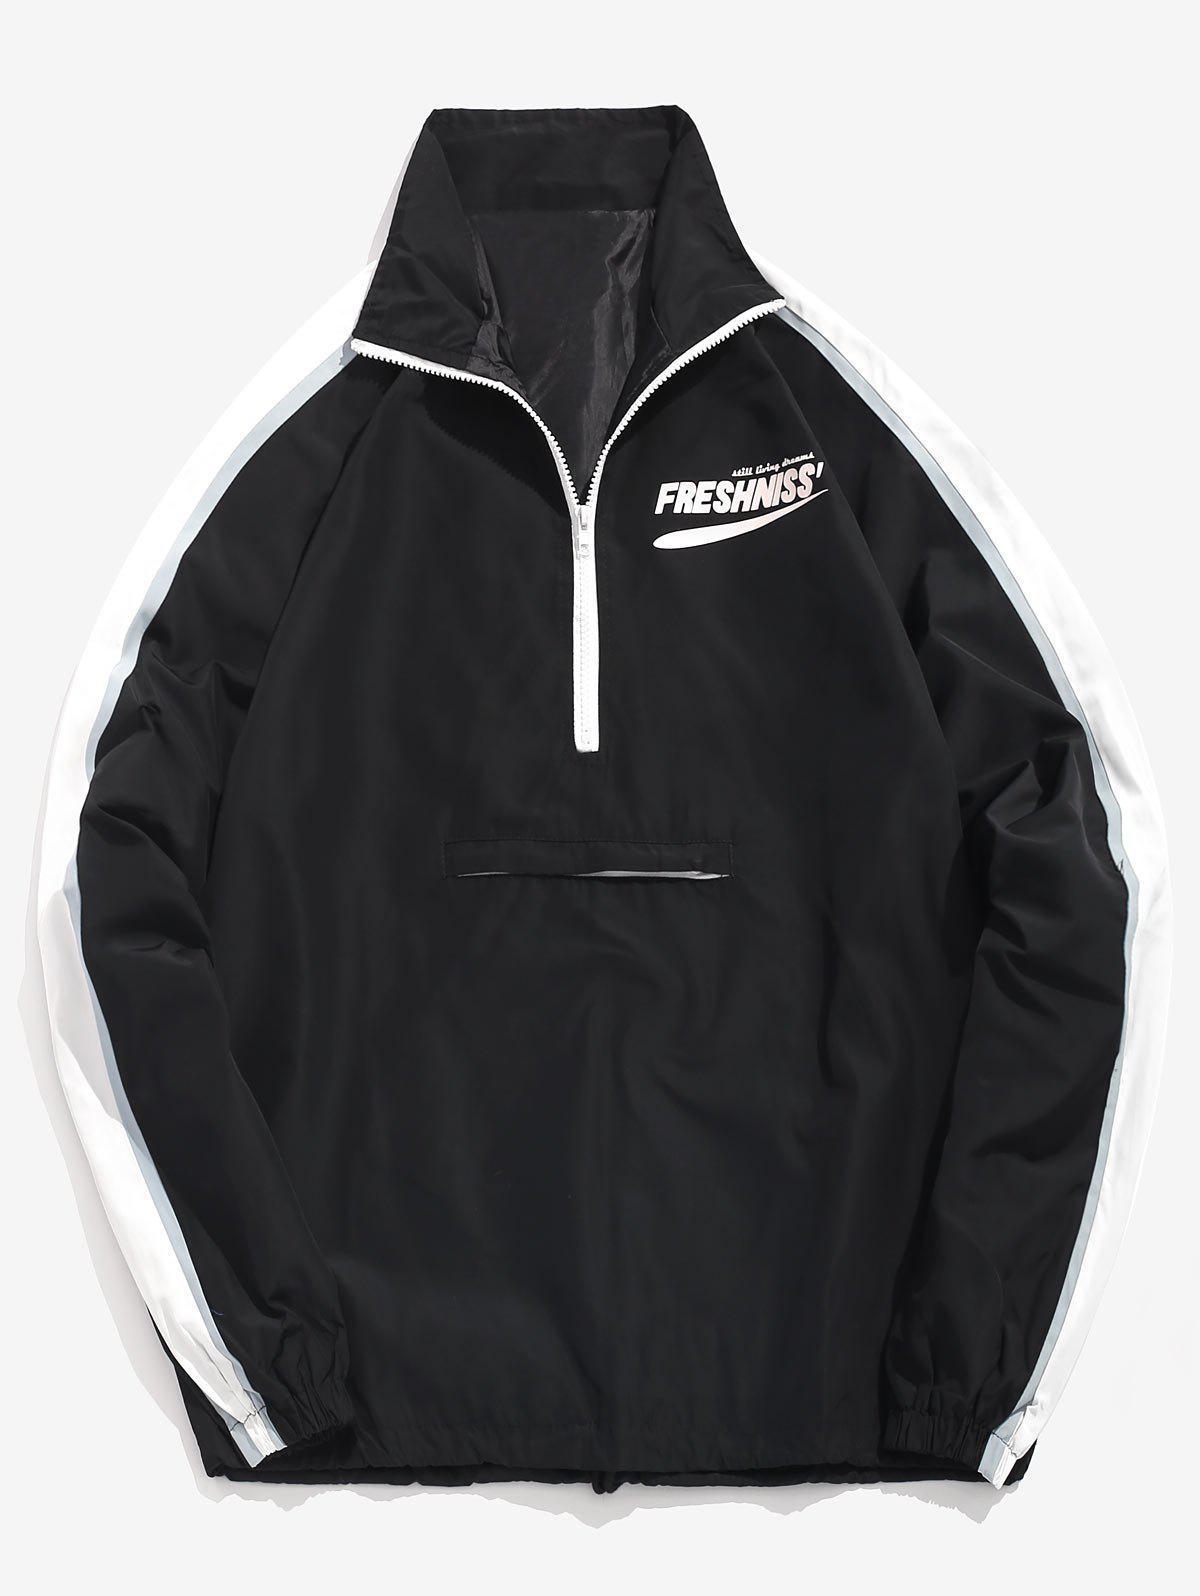 Half Zipper Letter Pullover Windbreaker Jacket, Black